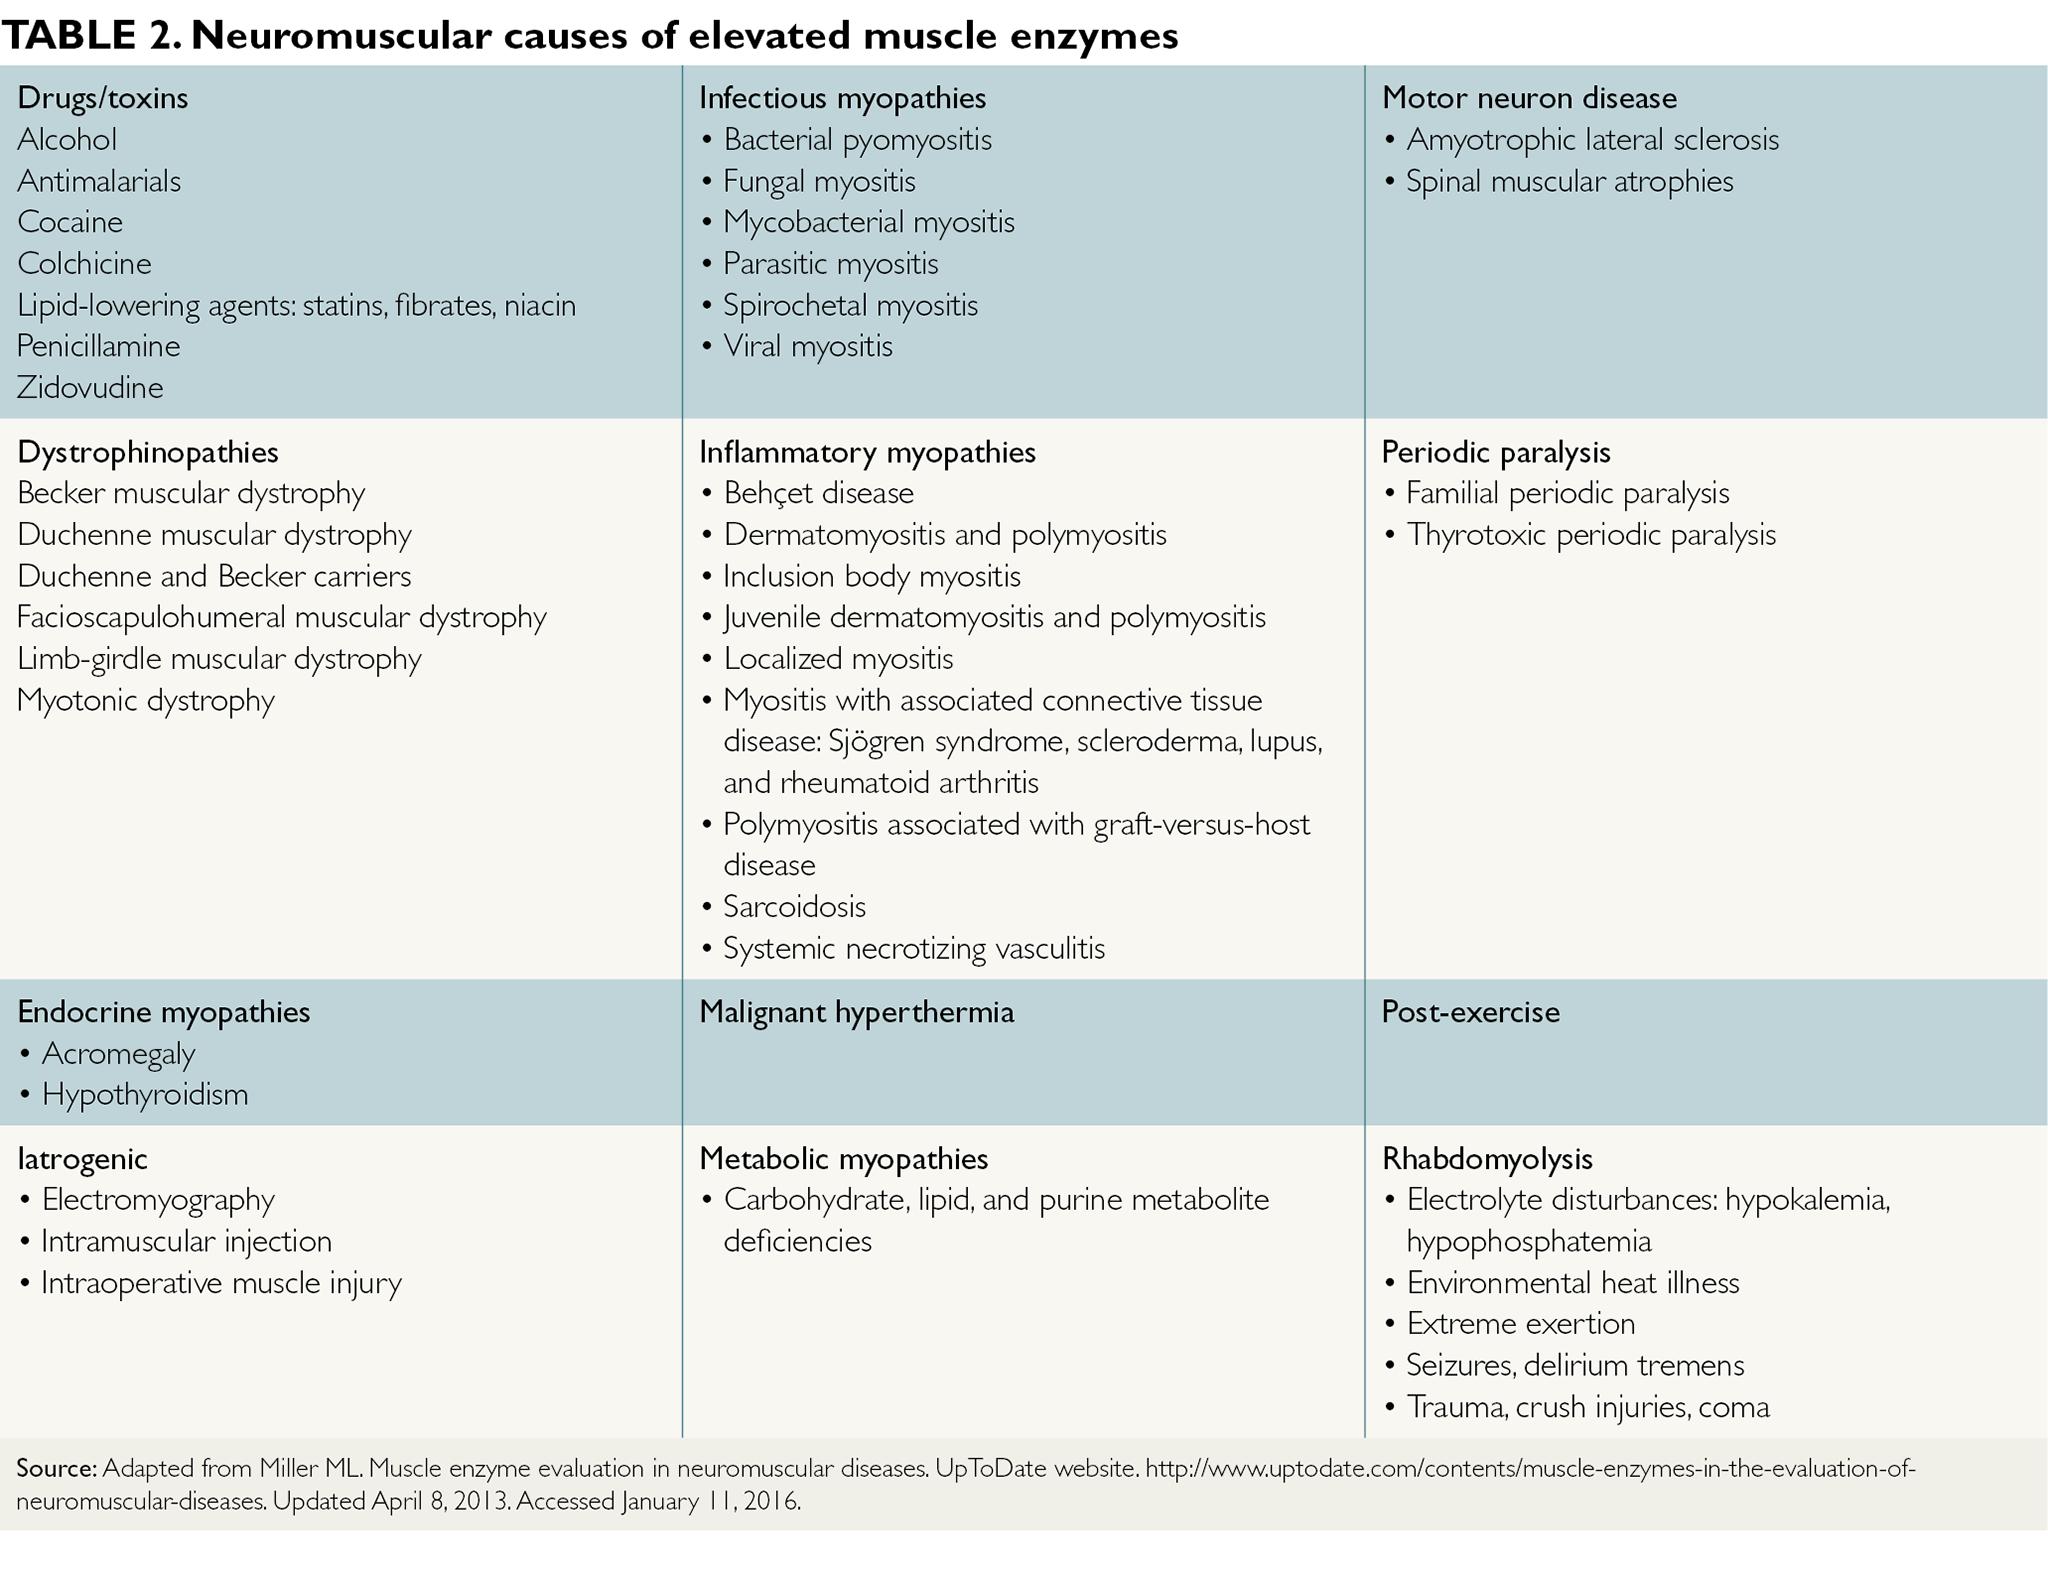 Markedly elevated serum transaminase levels - Page 2 of 2